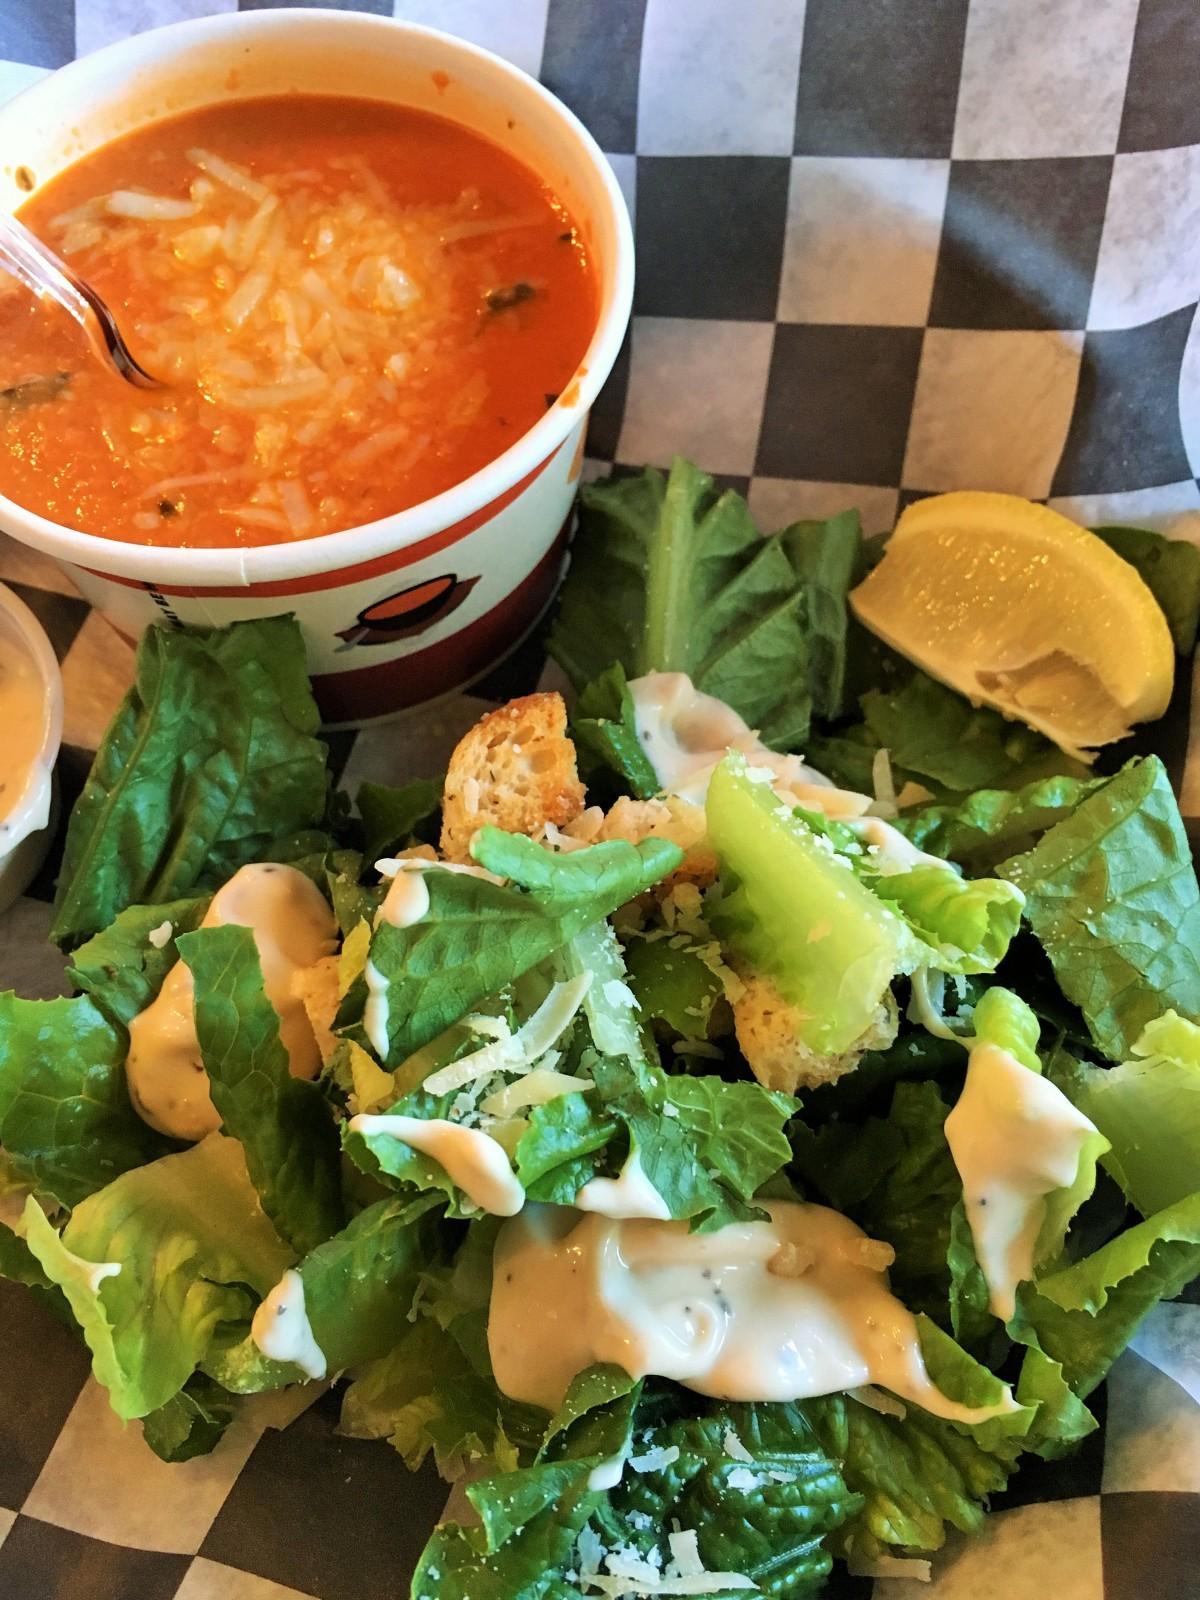 2-homemade-tomato-basil-soup-with-a-caesar-salad